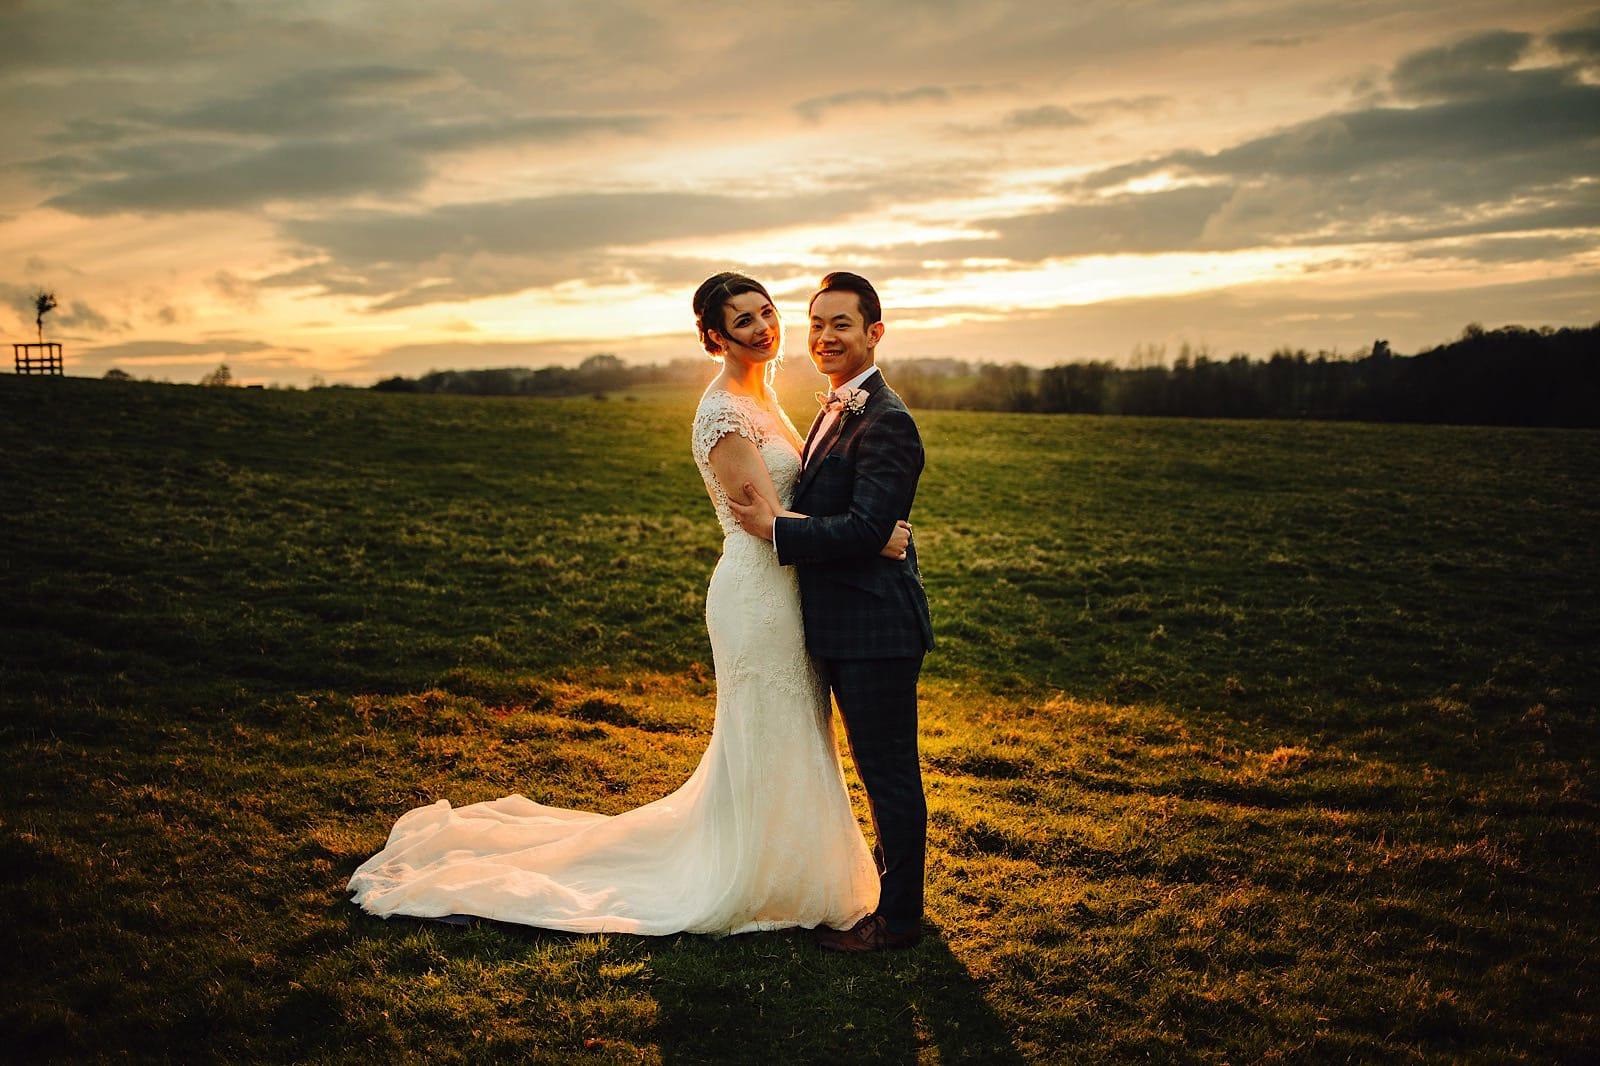 dodford manor northamptonshire wedding photography 0065